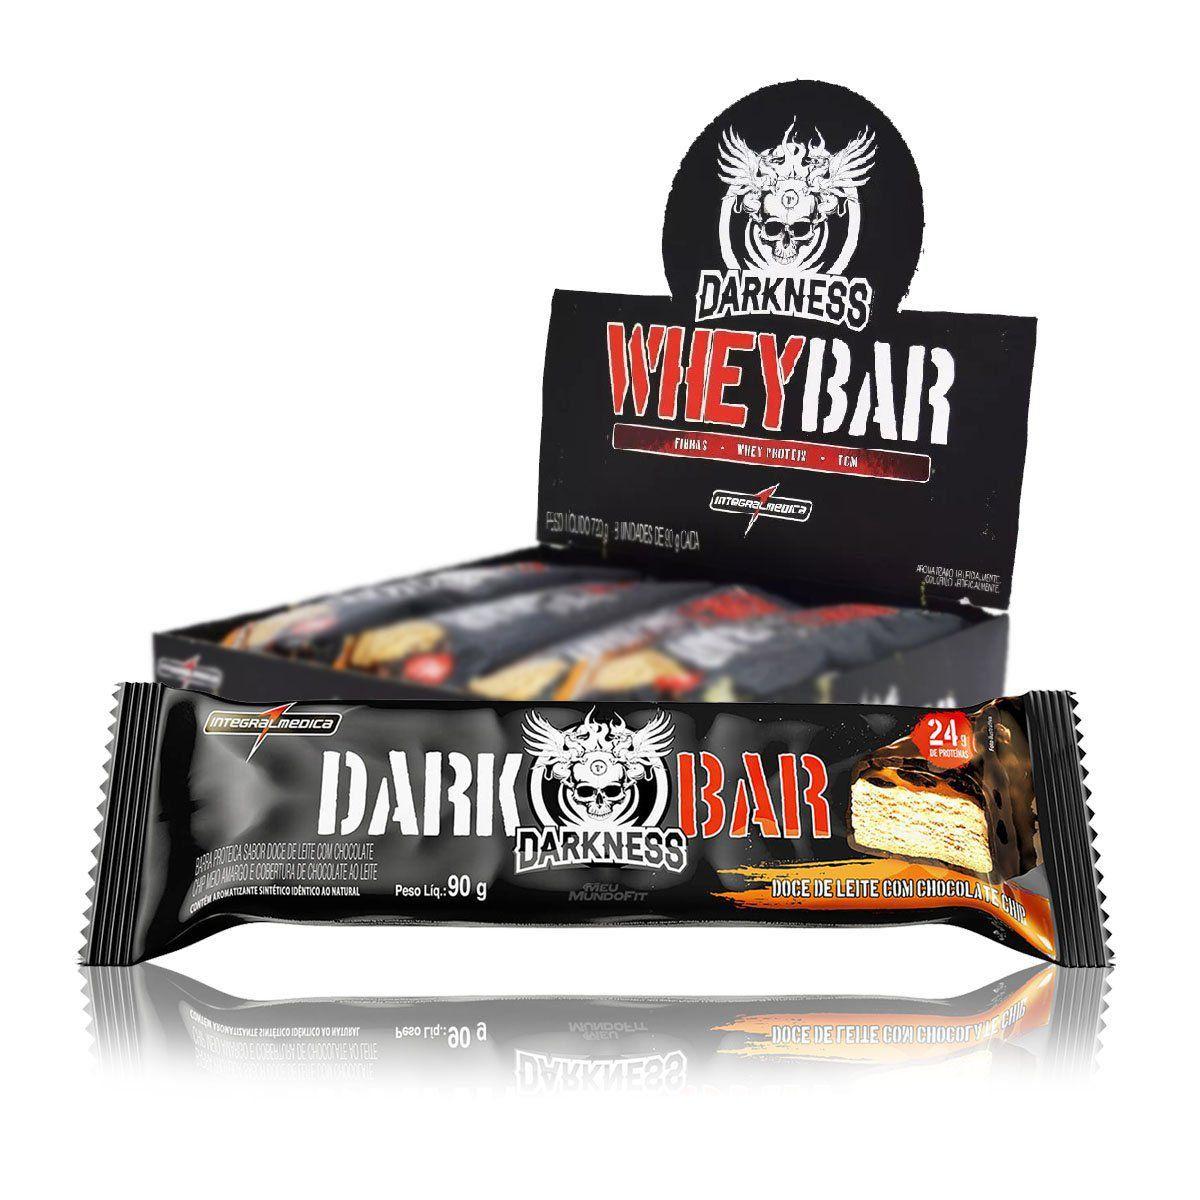 Caixa Whey Bar Darkness 8 Unidades 90g - IntegralMedica